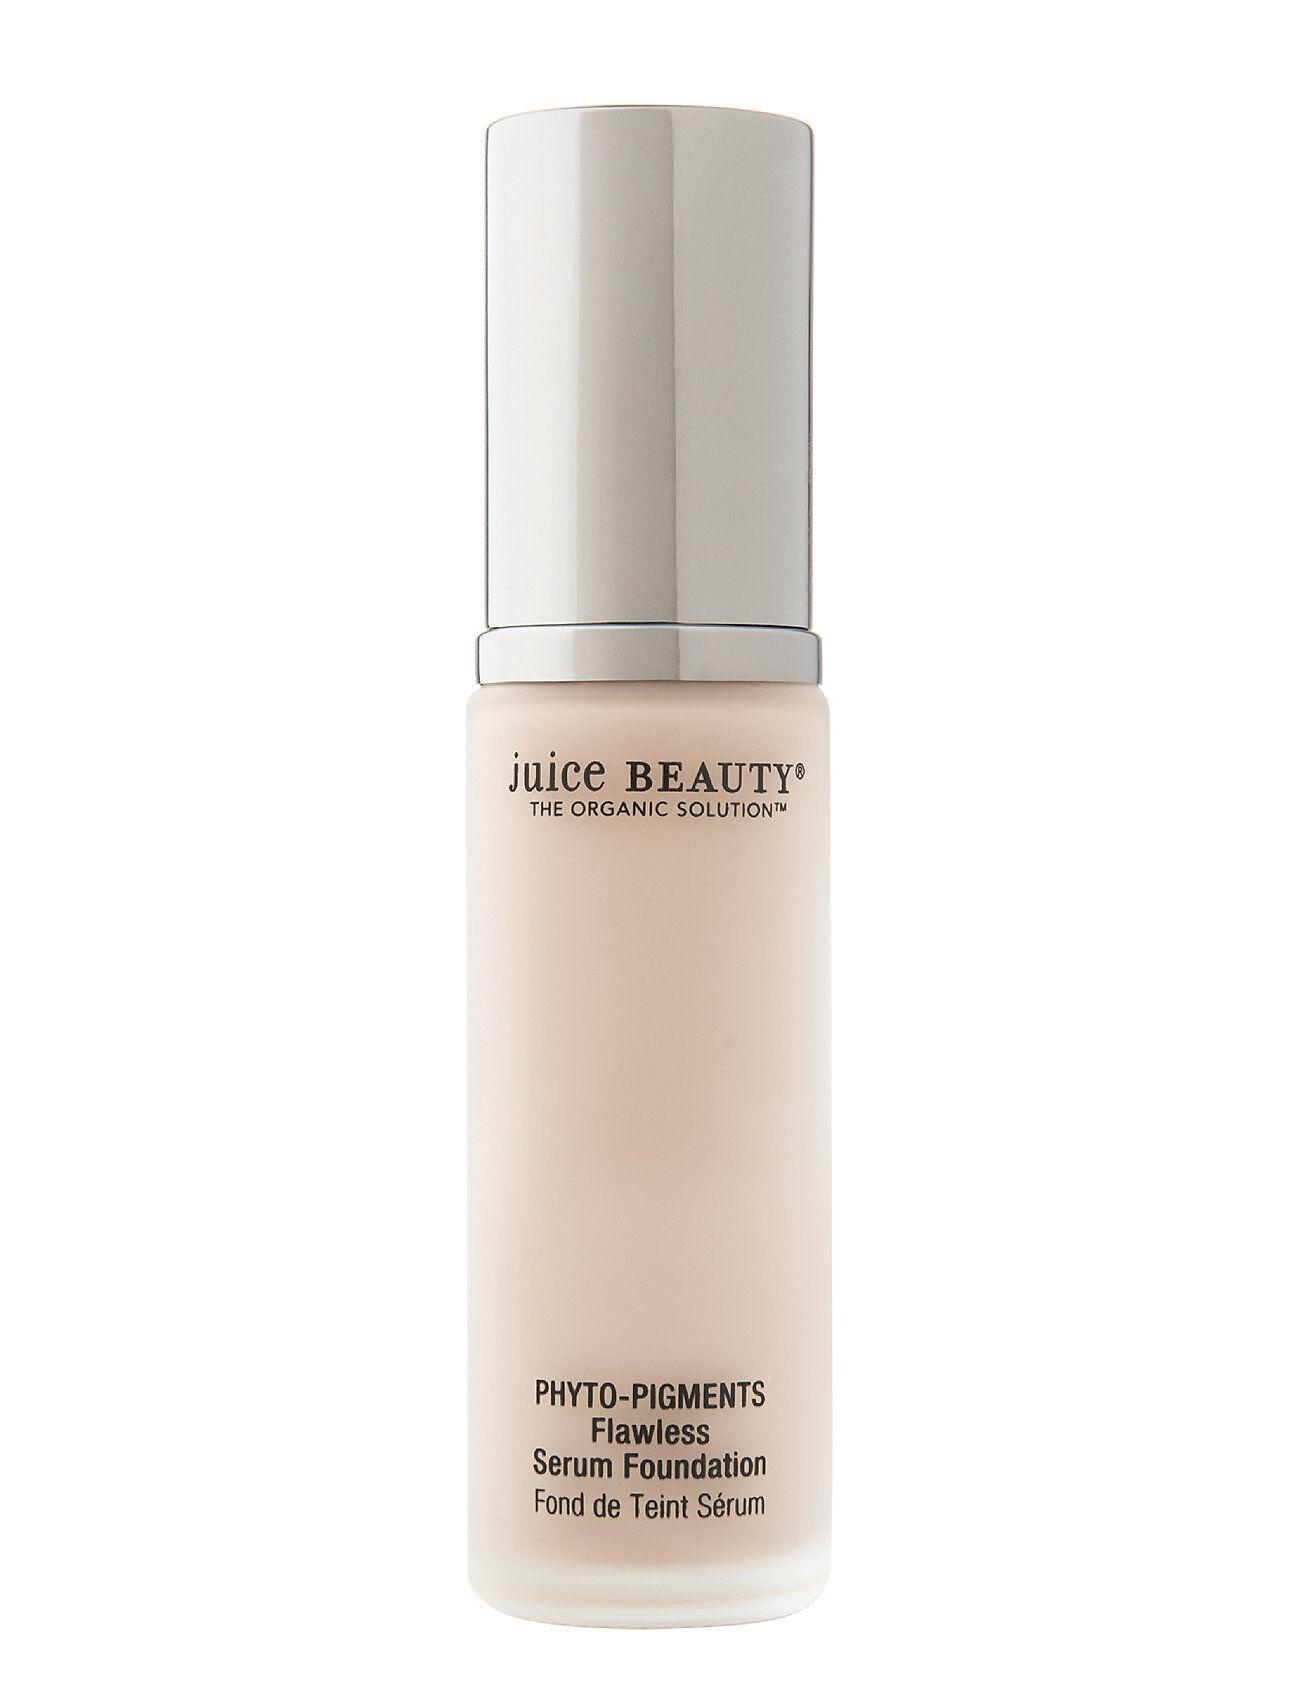 Juice Beauty Flawless Serum Foundation - 11 Rosy Beige